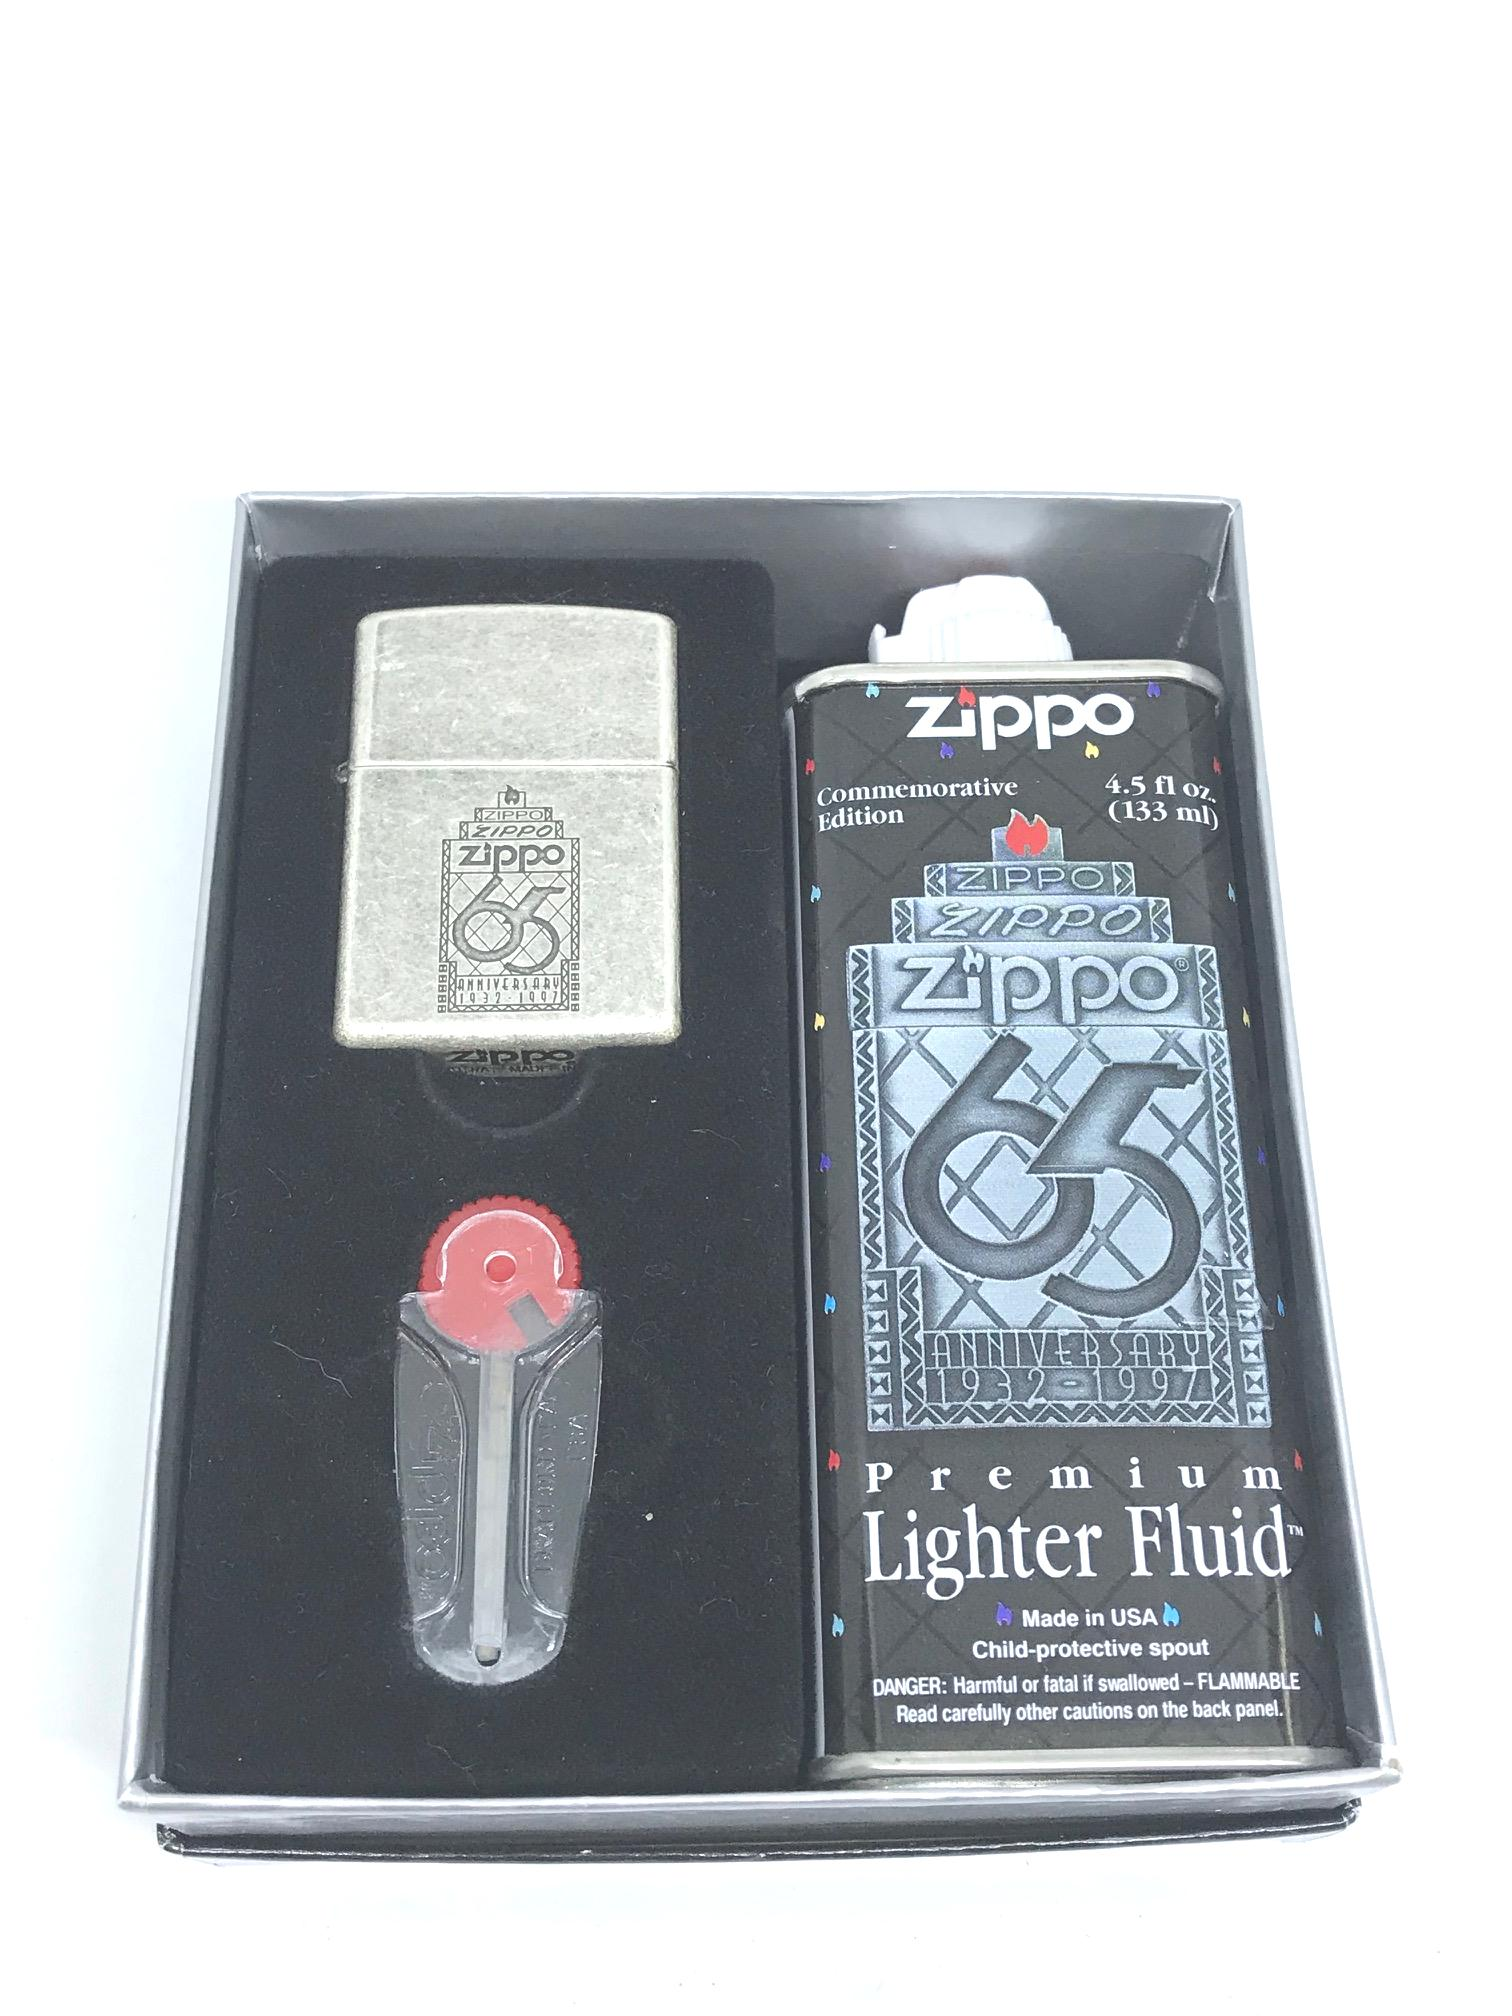 Zippo co 65th Anniversary - ky niem 65 nam thanh lap zippo NTZ585